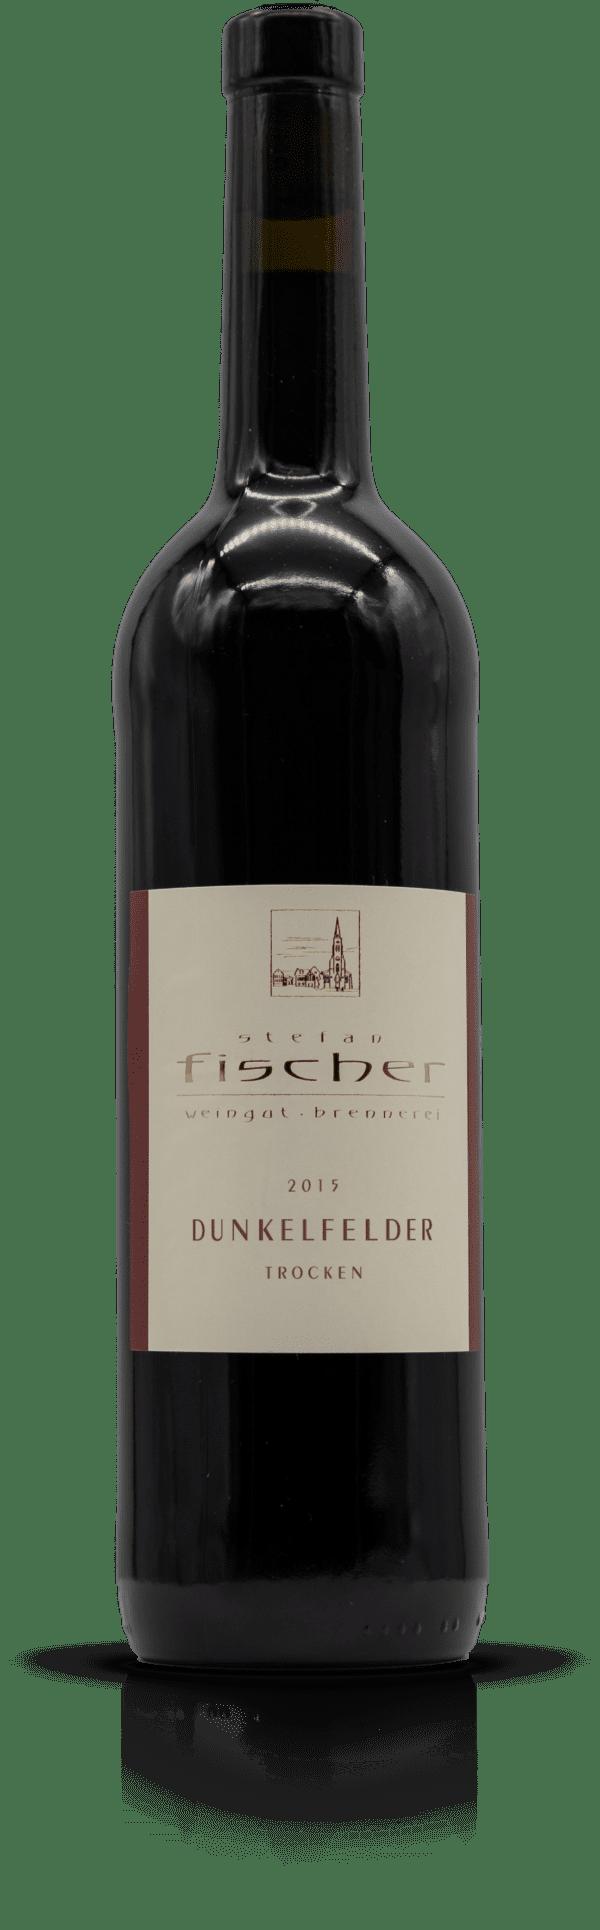 Weingut Stefan Fischer DUNKELFELDER trocken